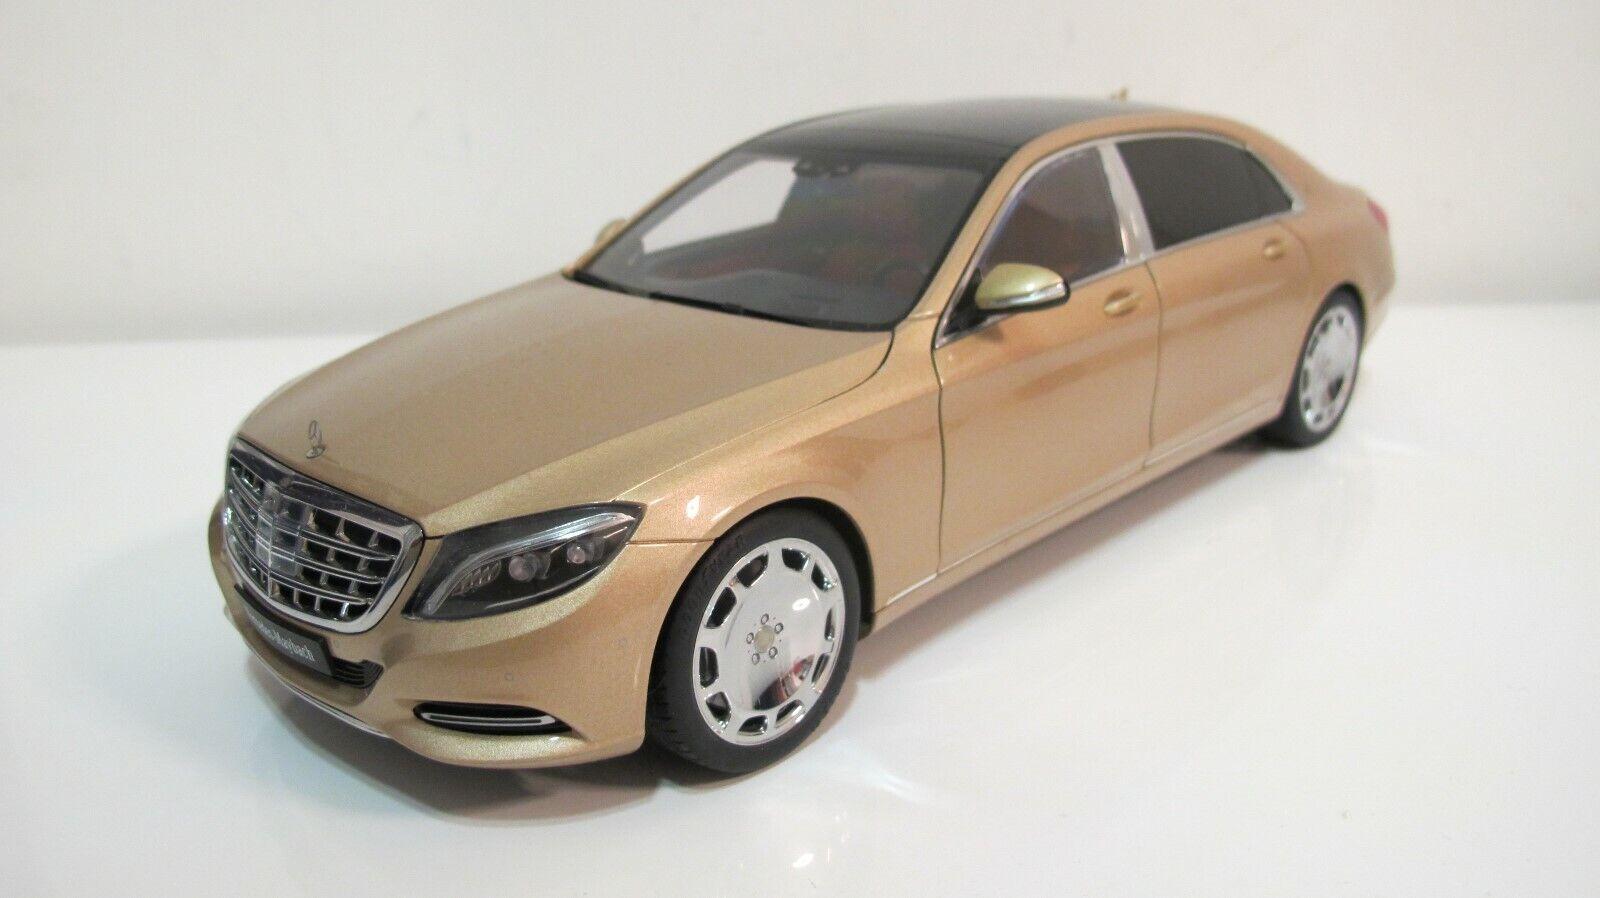 diseño único 1 18 Autoart Mercedes Benz Benz Benz Maybach S KLASSE S600 W222 oro DIECAST COCHES  ¡no ser extrañado!